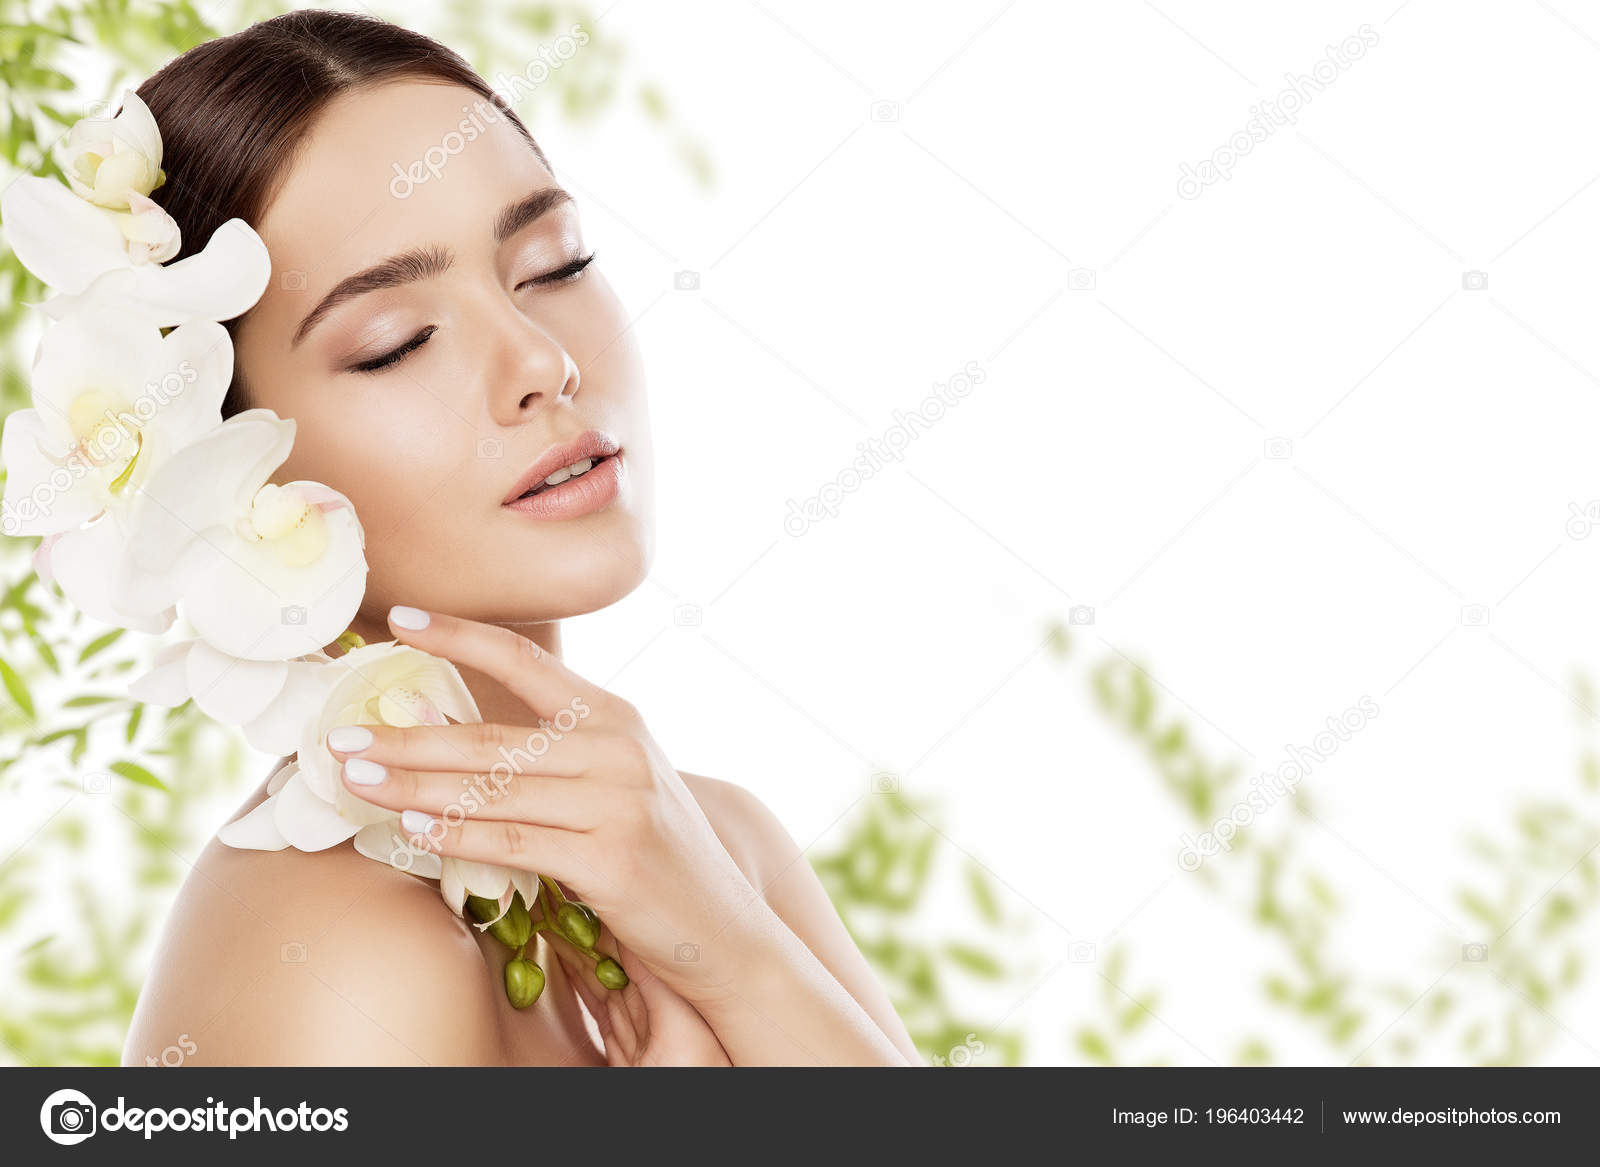 Beauty Skin Care Face Makeup Woman Skincare Natural Make Beautiful